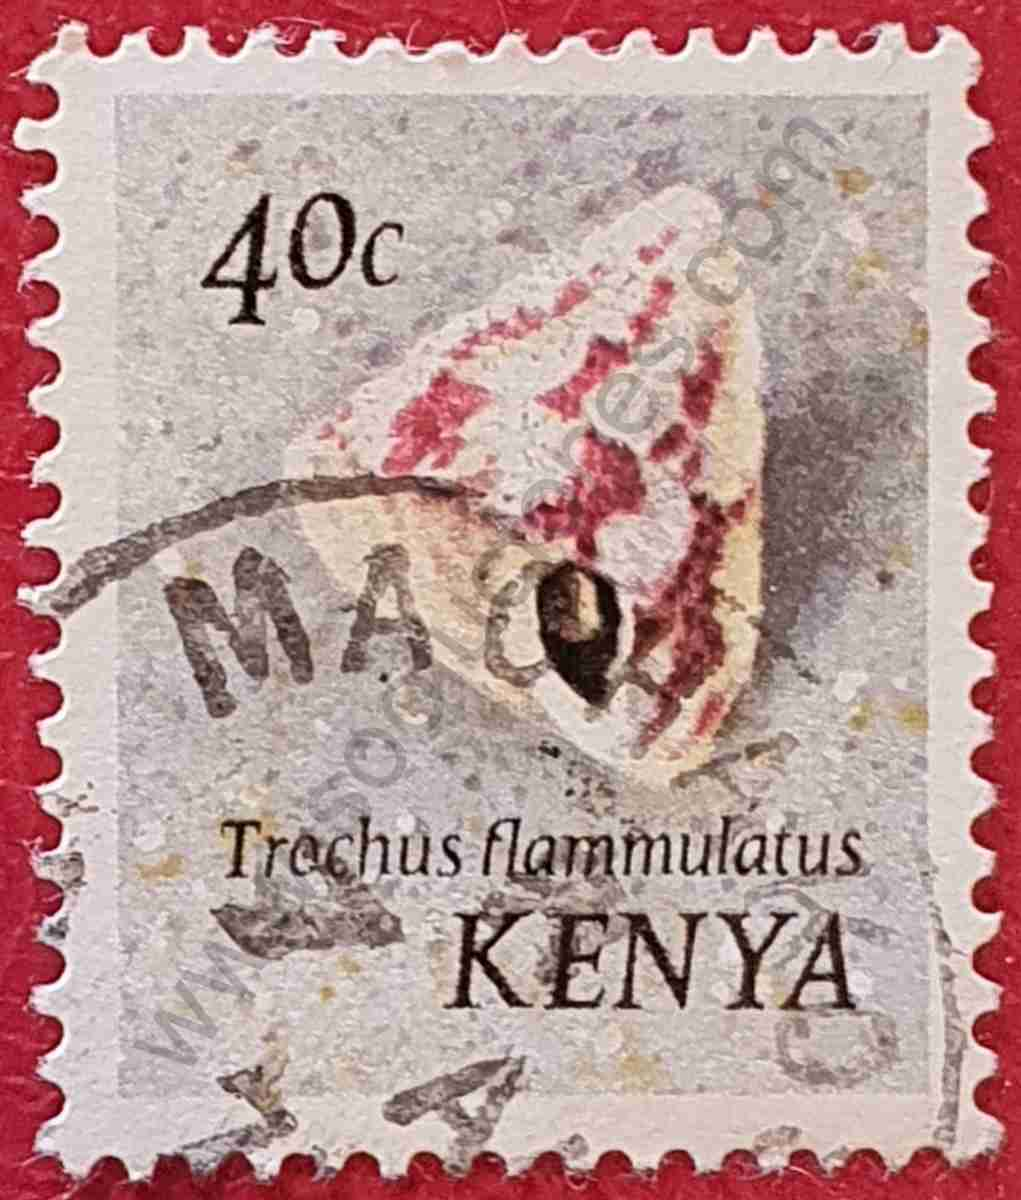 Sello caracol marino - Kenia 1971